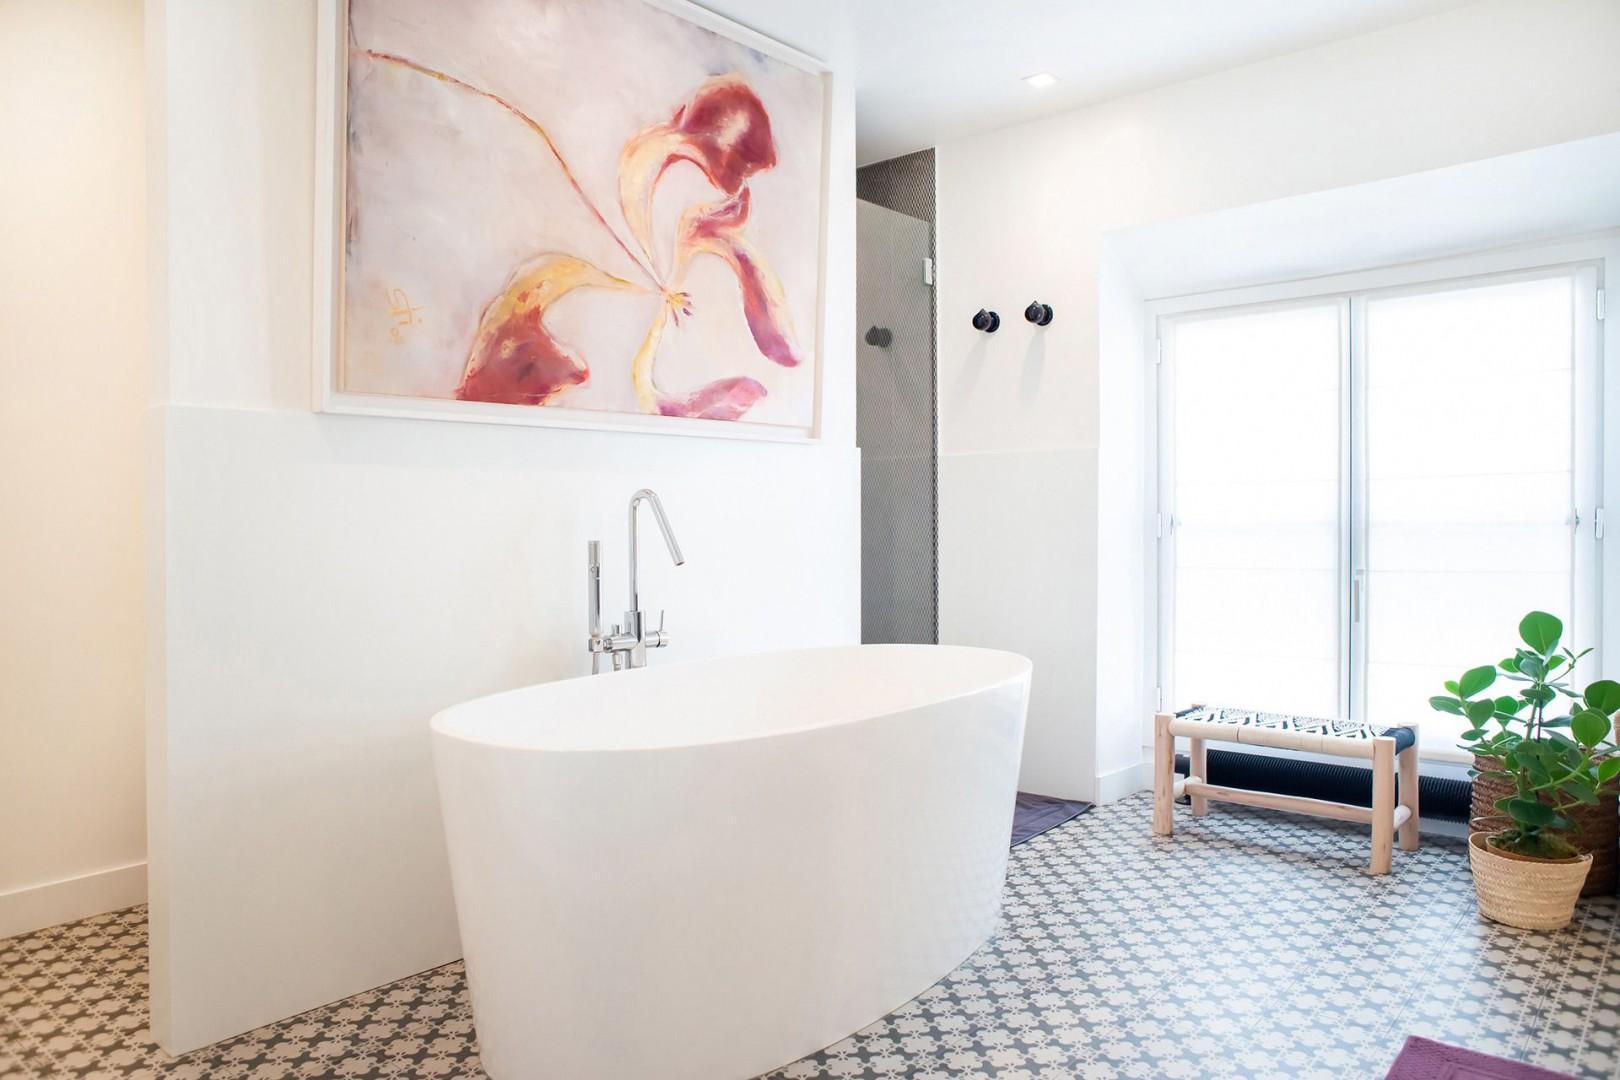 Bathroom 2 has a modern bath perfect for a long soak